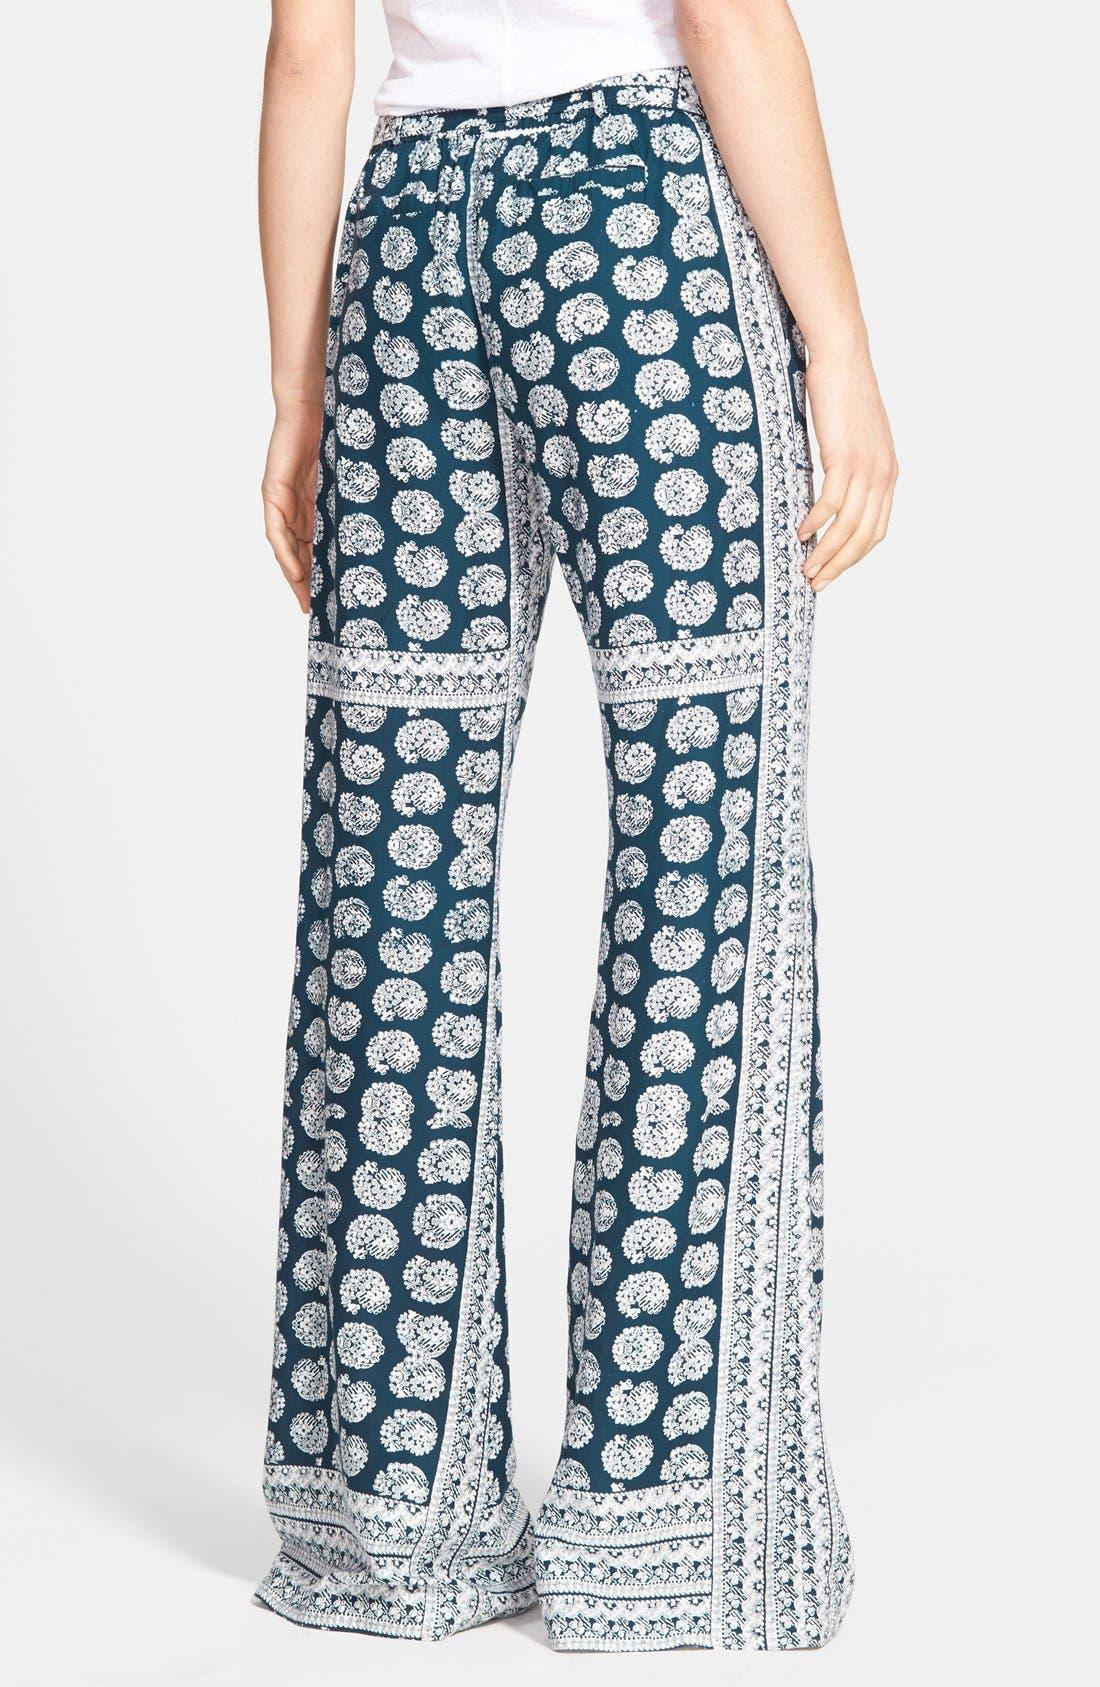 JESSICA SIMPSON, 'Kingston' Soft Woven Pants, Alternate thumbnail 3, color, 410